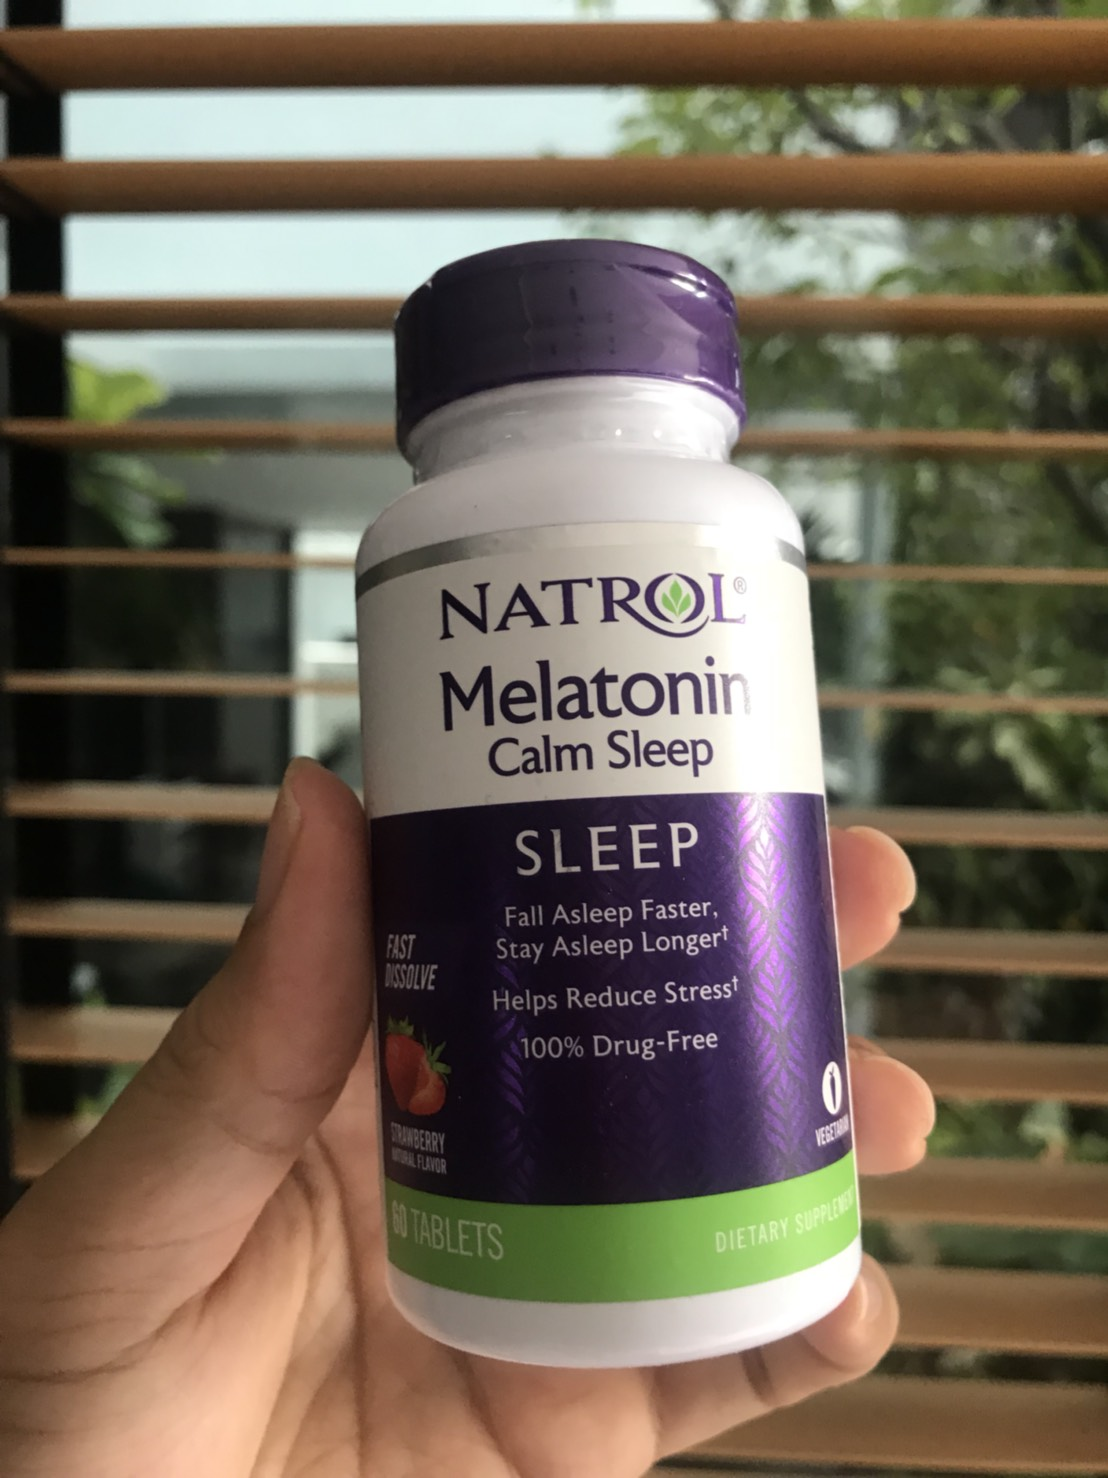 # 6mg # Natrol, Advanced Melatonin Calm Sleep, Fast Dissolve, Strawberry Flavor, 60 Tablets